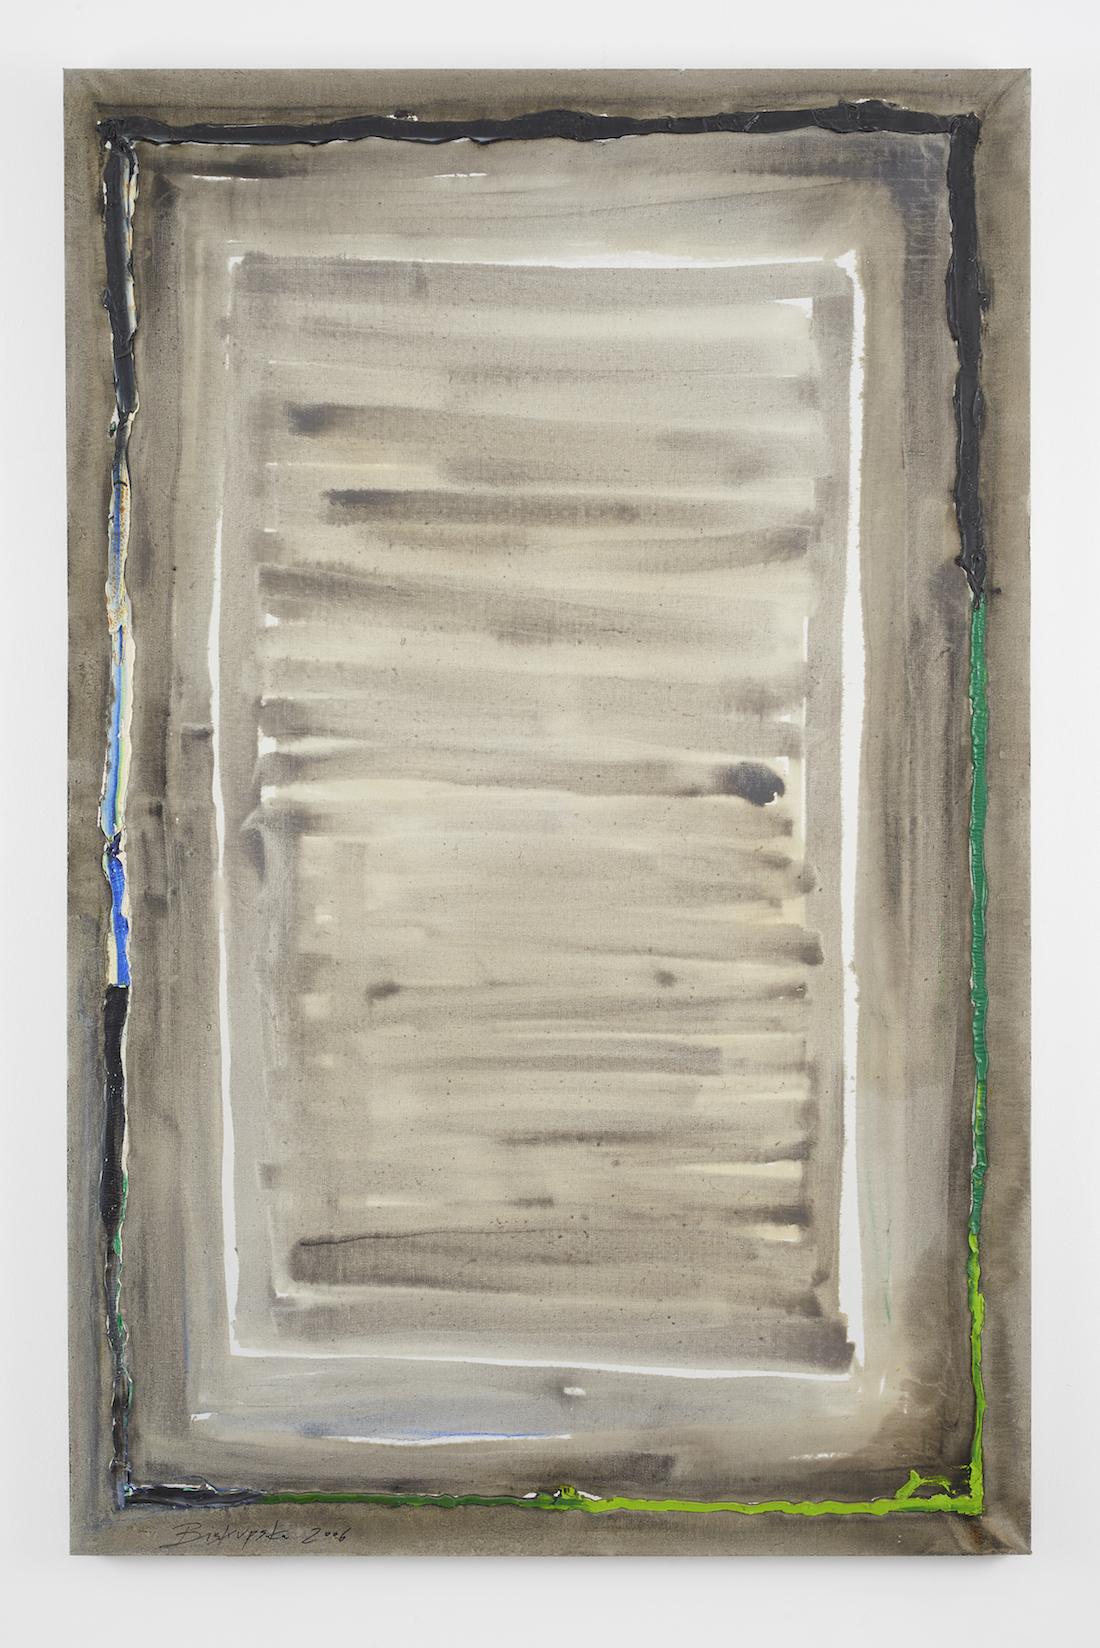 Bożenna Biskupska, Epiphany of Time, 2019, létrangère, installation view